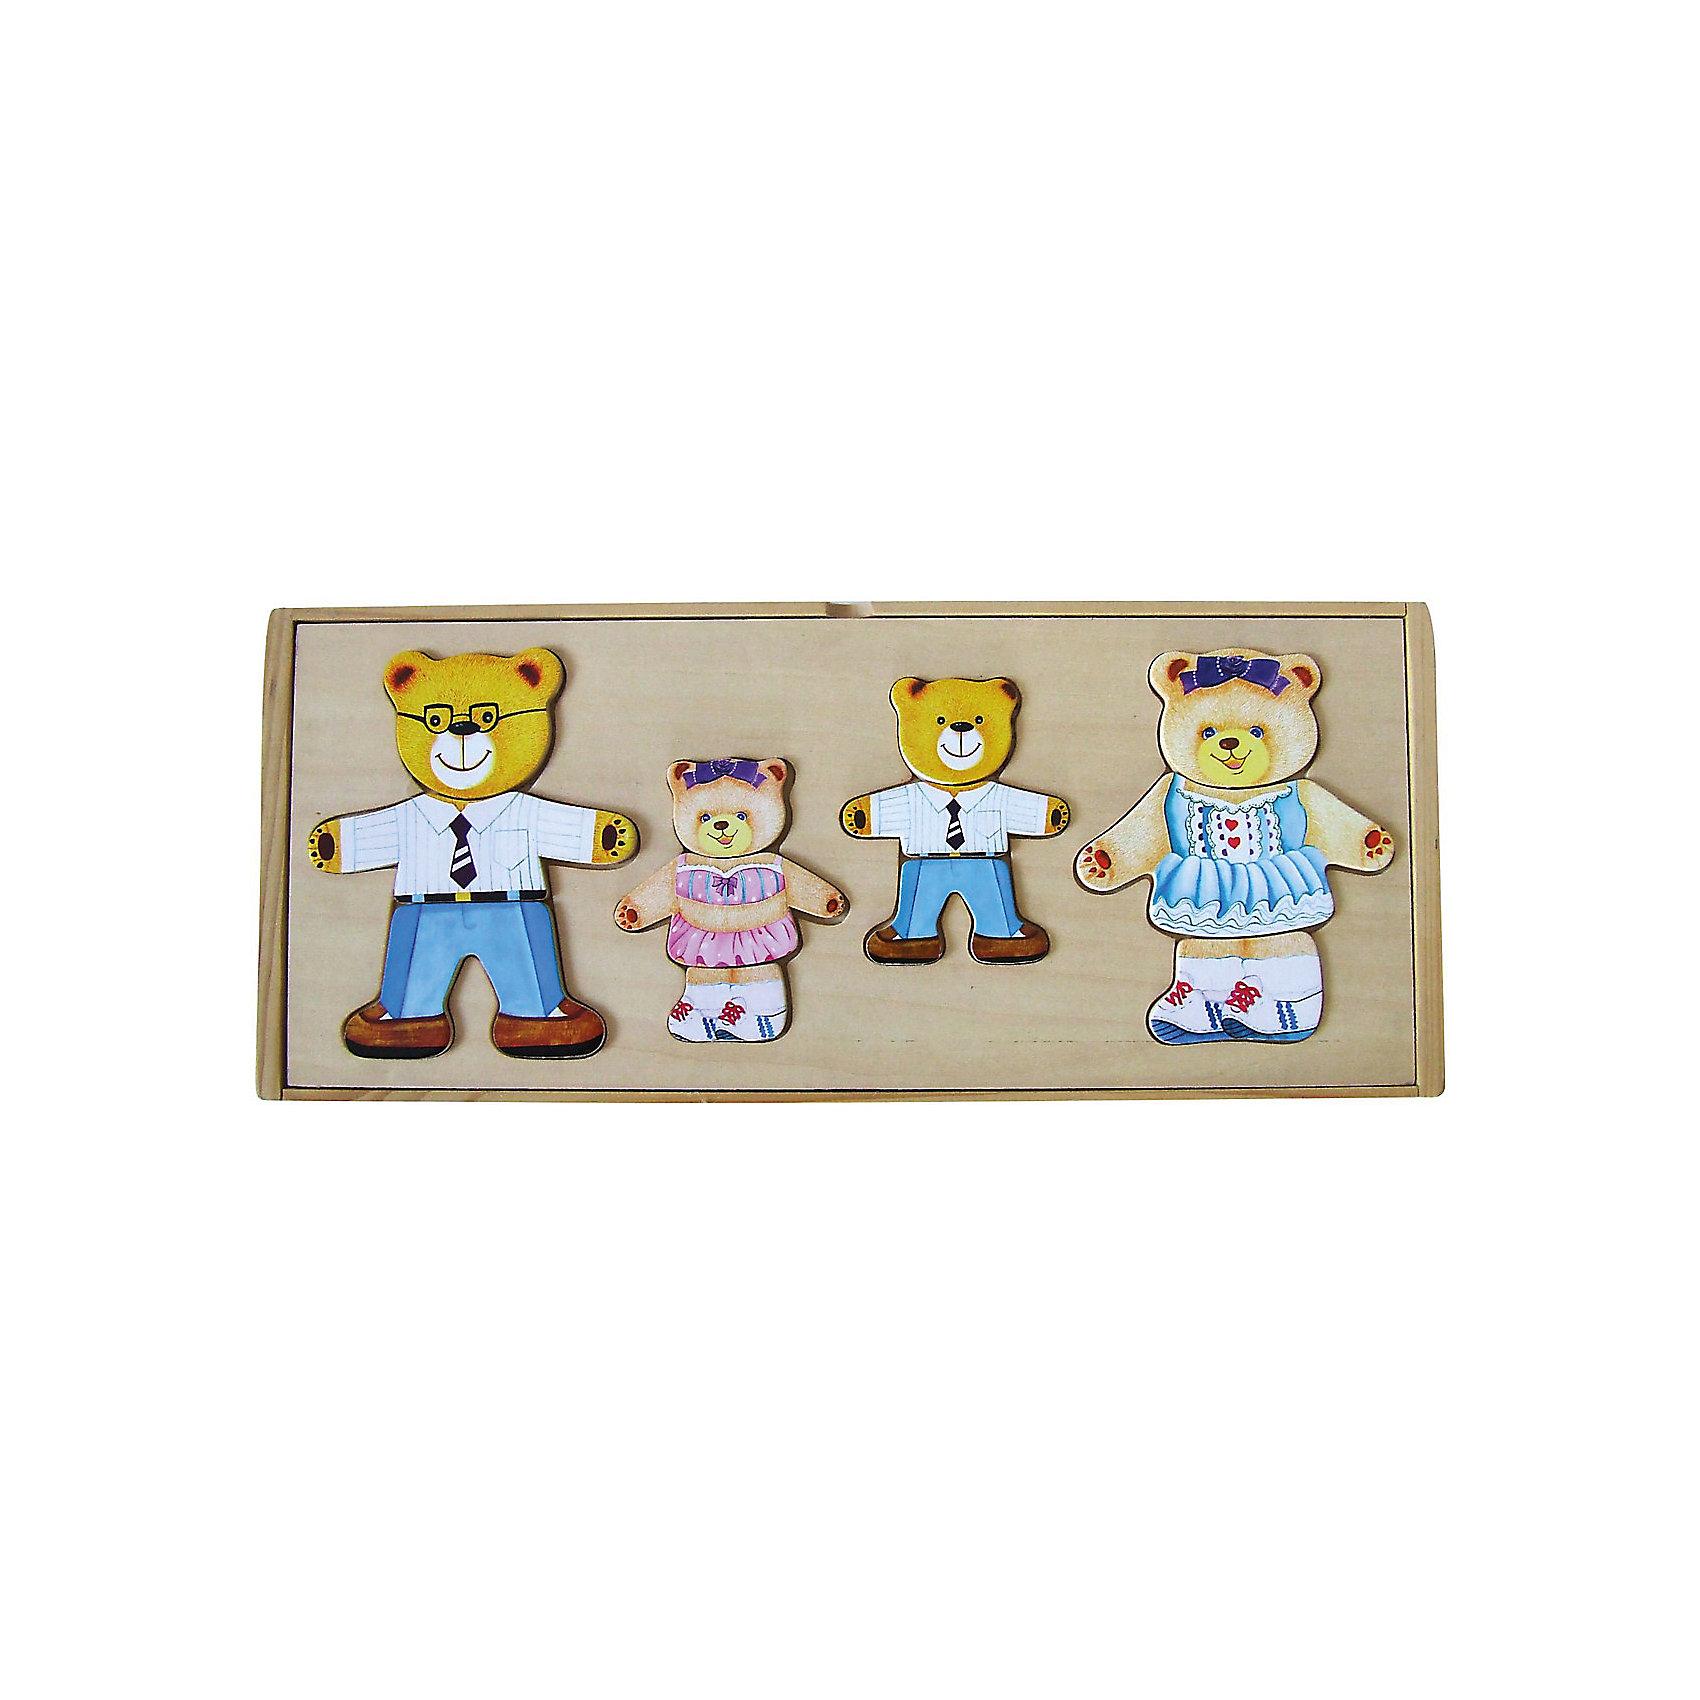 Набор с одеждой 4 медведя, СТЕЛЛА+<br><br>Ширина мм: 320<br>Глубина мм: 130<br>Высота мм: 40<br>Вес г: 1000<br>Возраст от месяцев: 36<br>Возраст до месяцев: 60<br>Пол: Унисекс<br>Возраст: Детский<br>SKU: 5426469